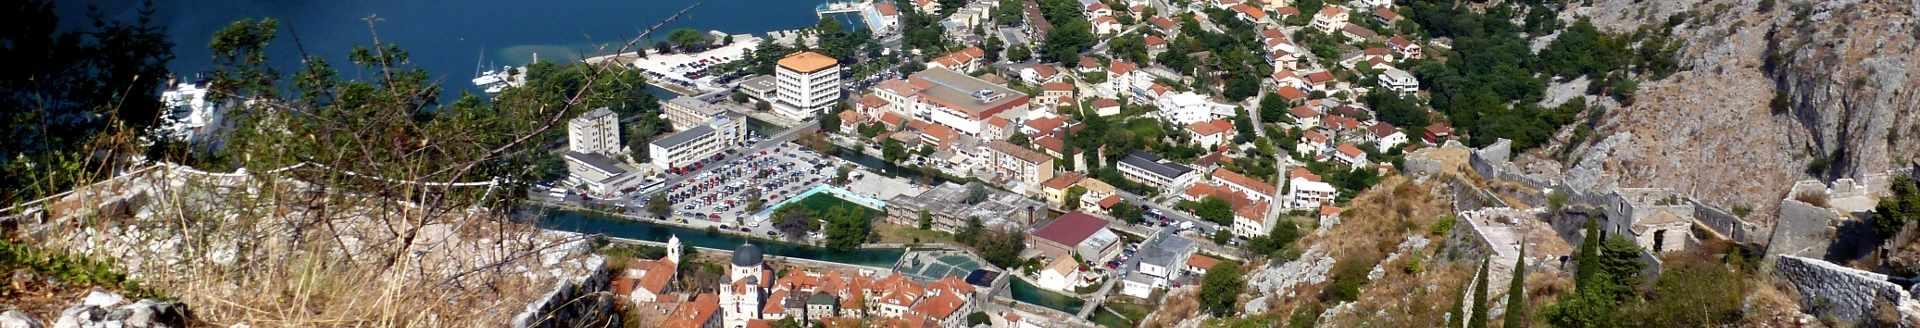 kotor excursiones cruceros Montenegro